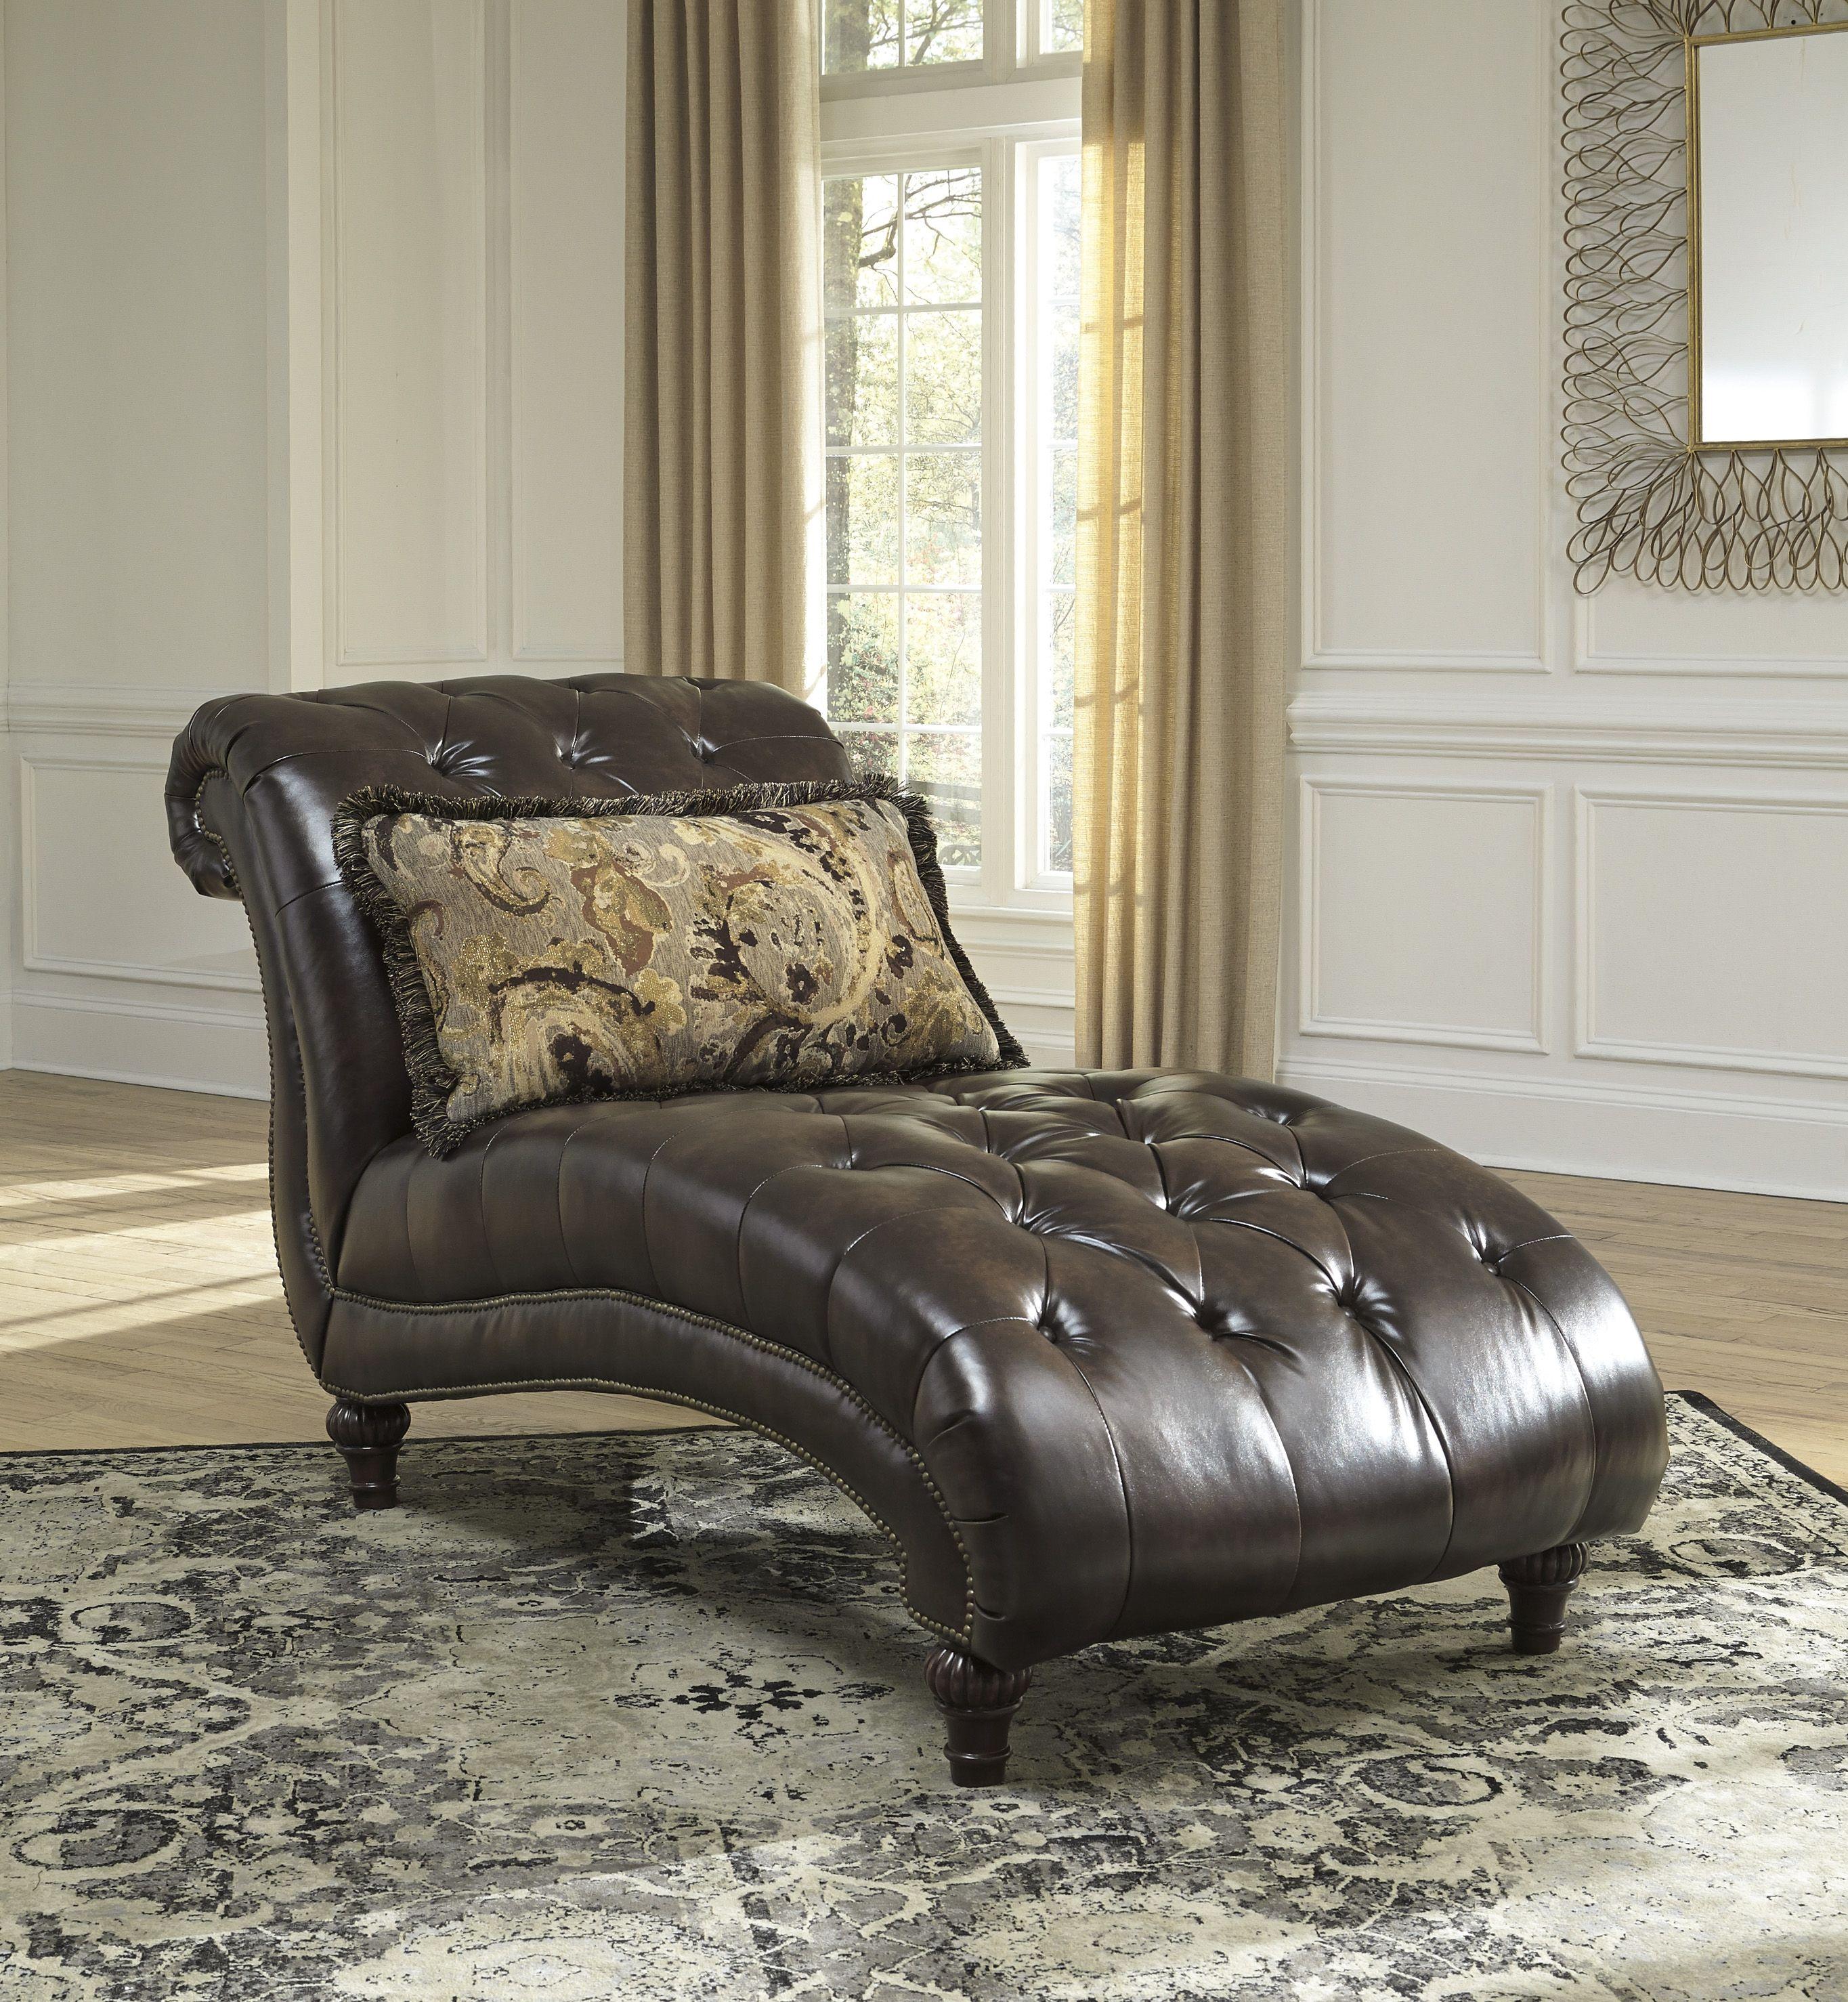 Ashley Furniture Winnsboro Durablend Chaise The Classy Home